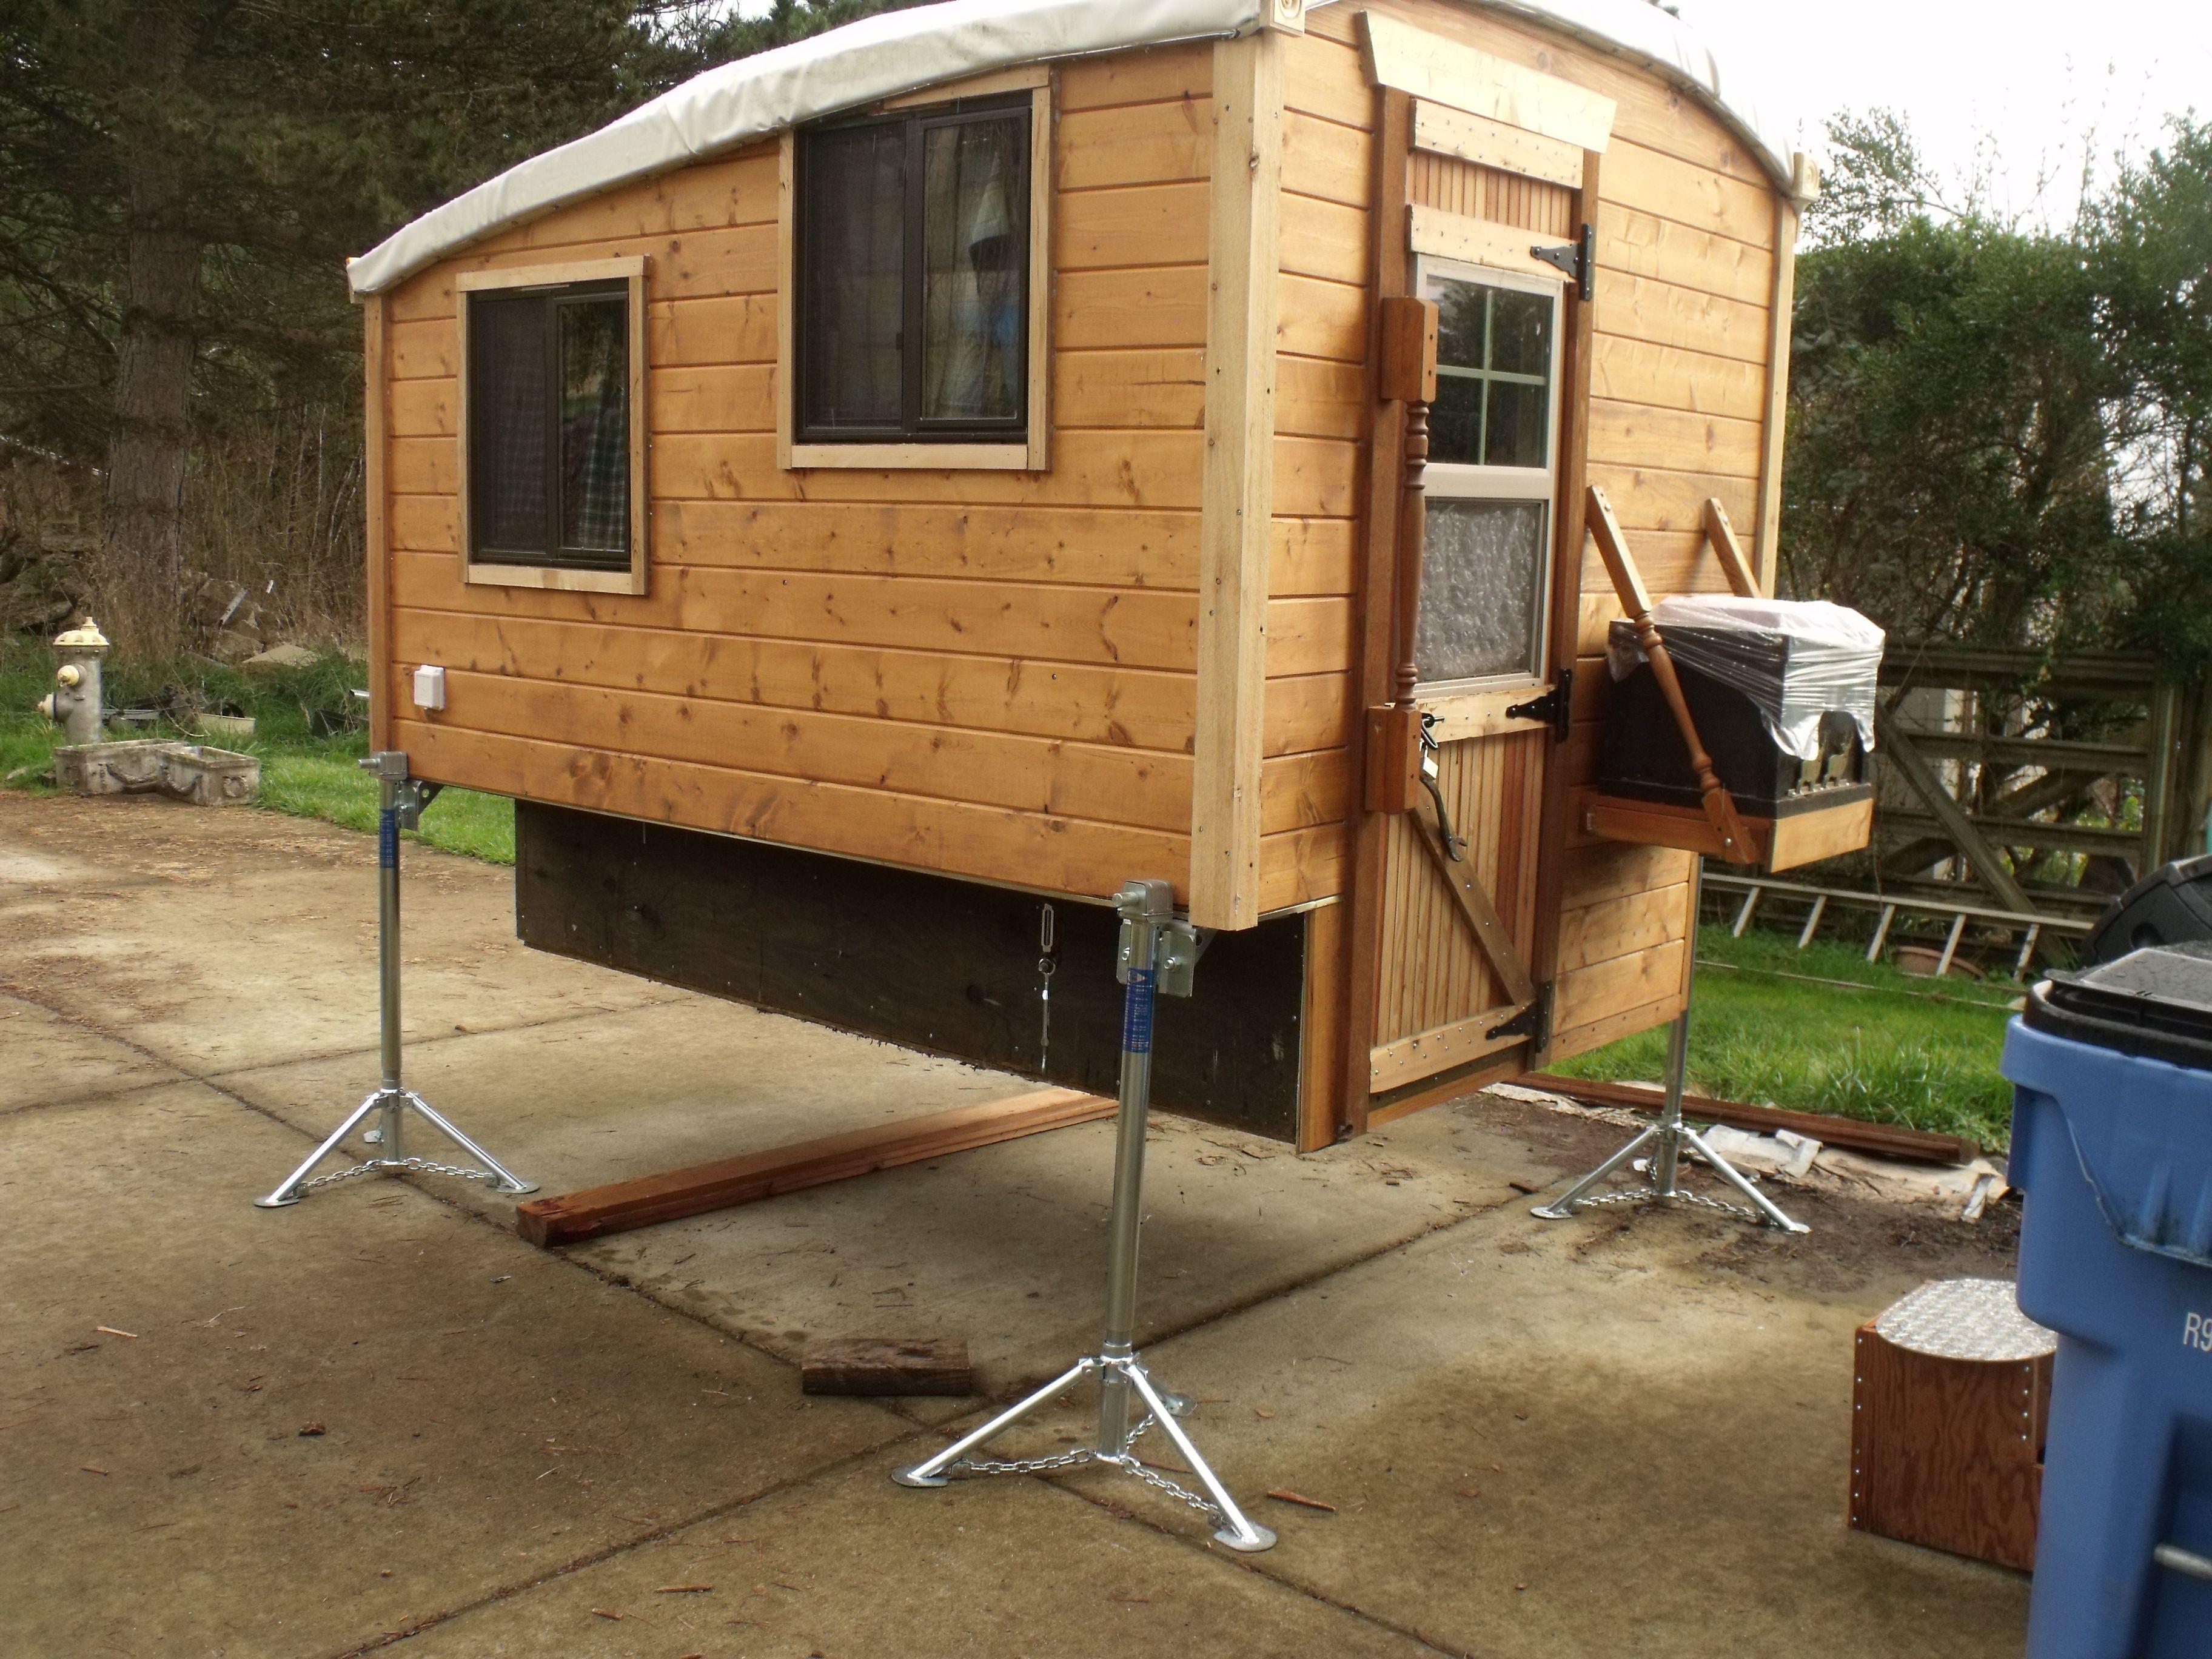 Camper now off trailer Camping trailer, Pickup camper